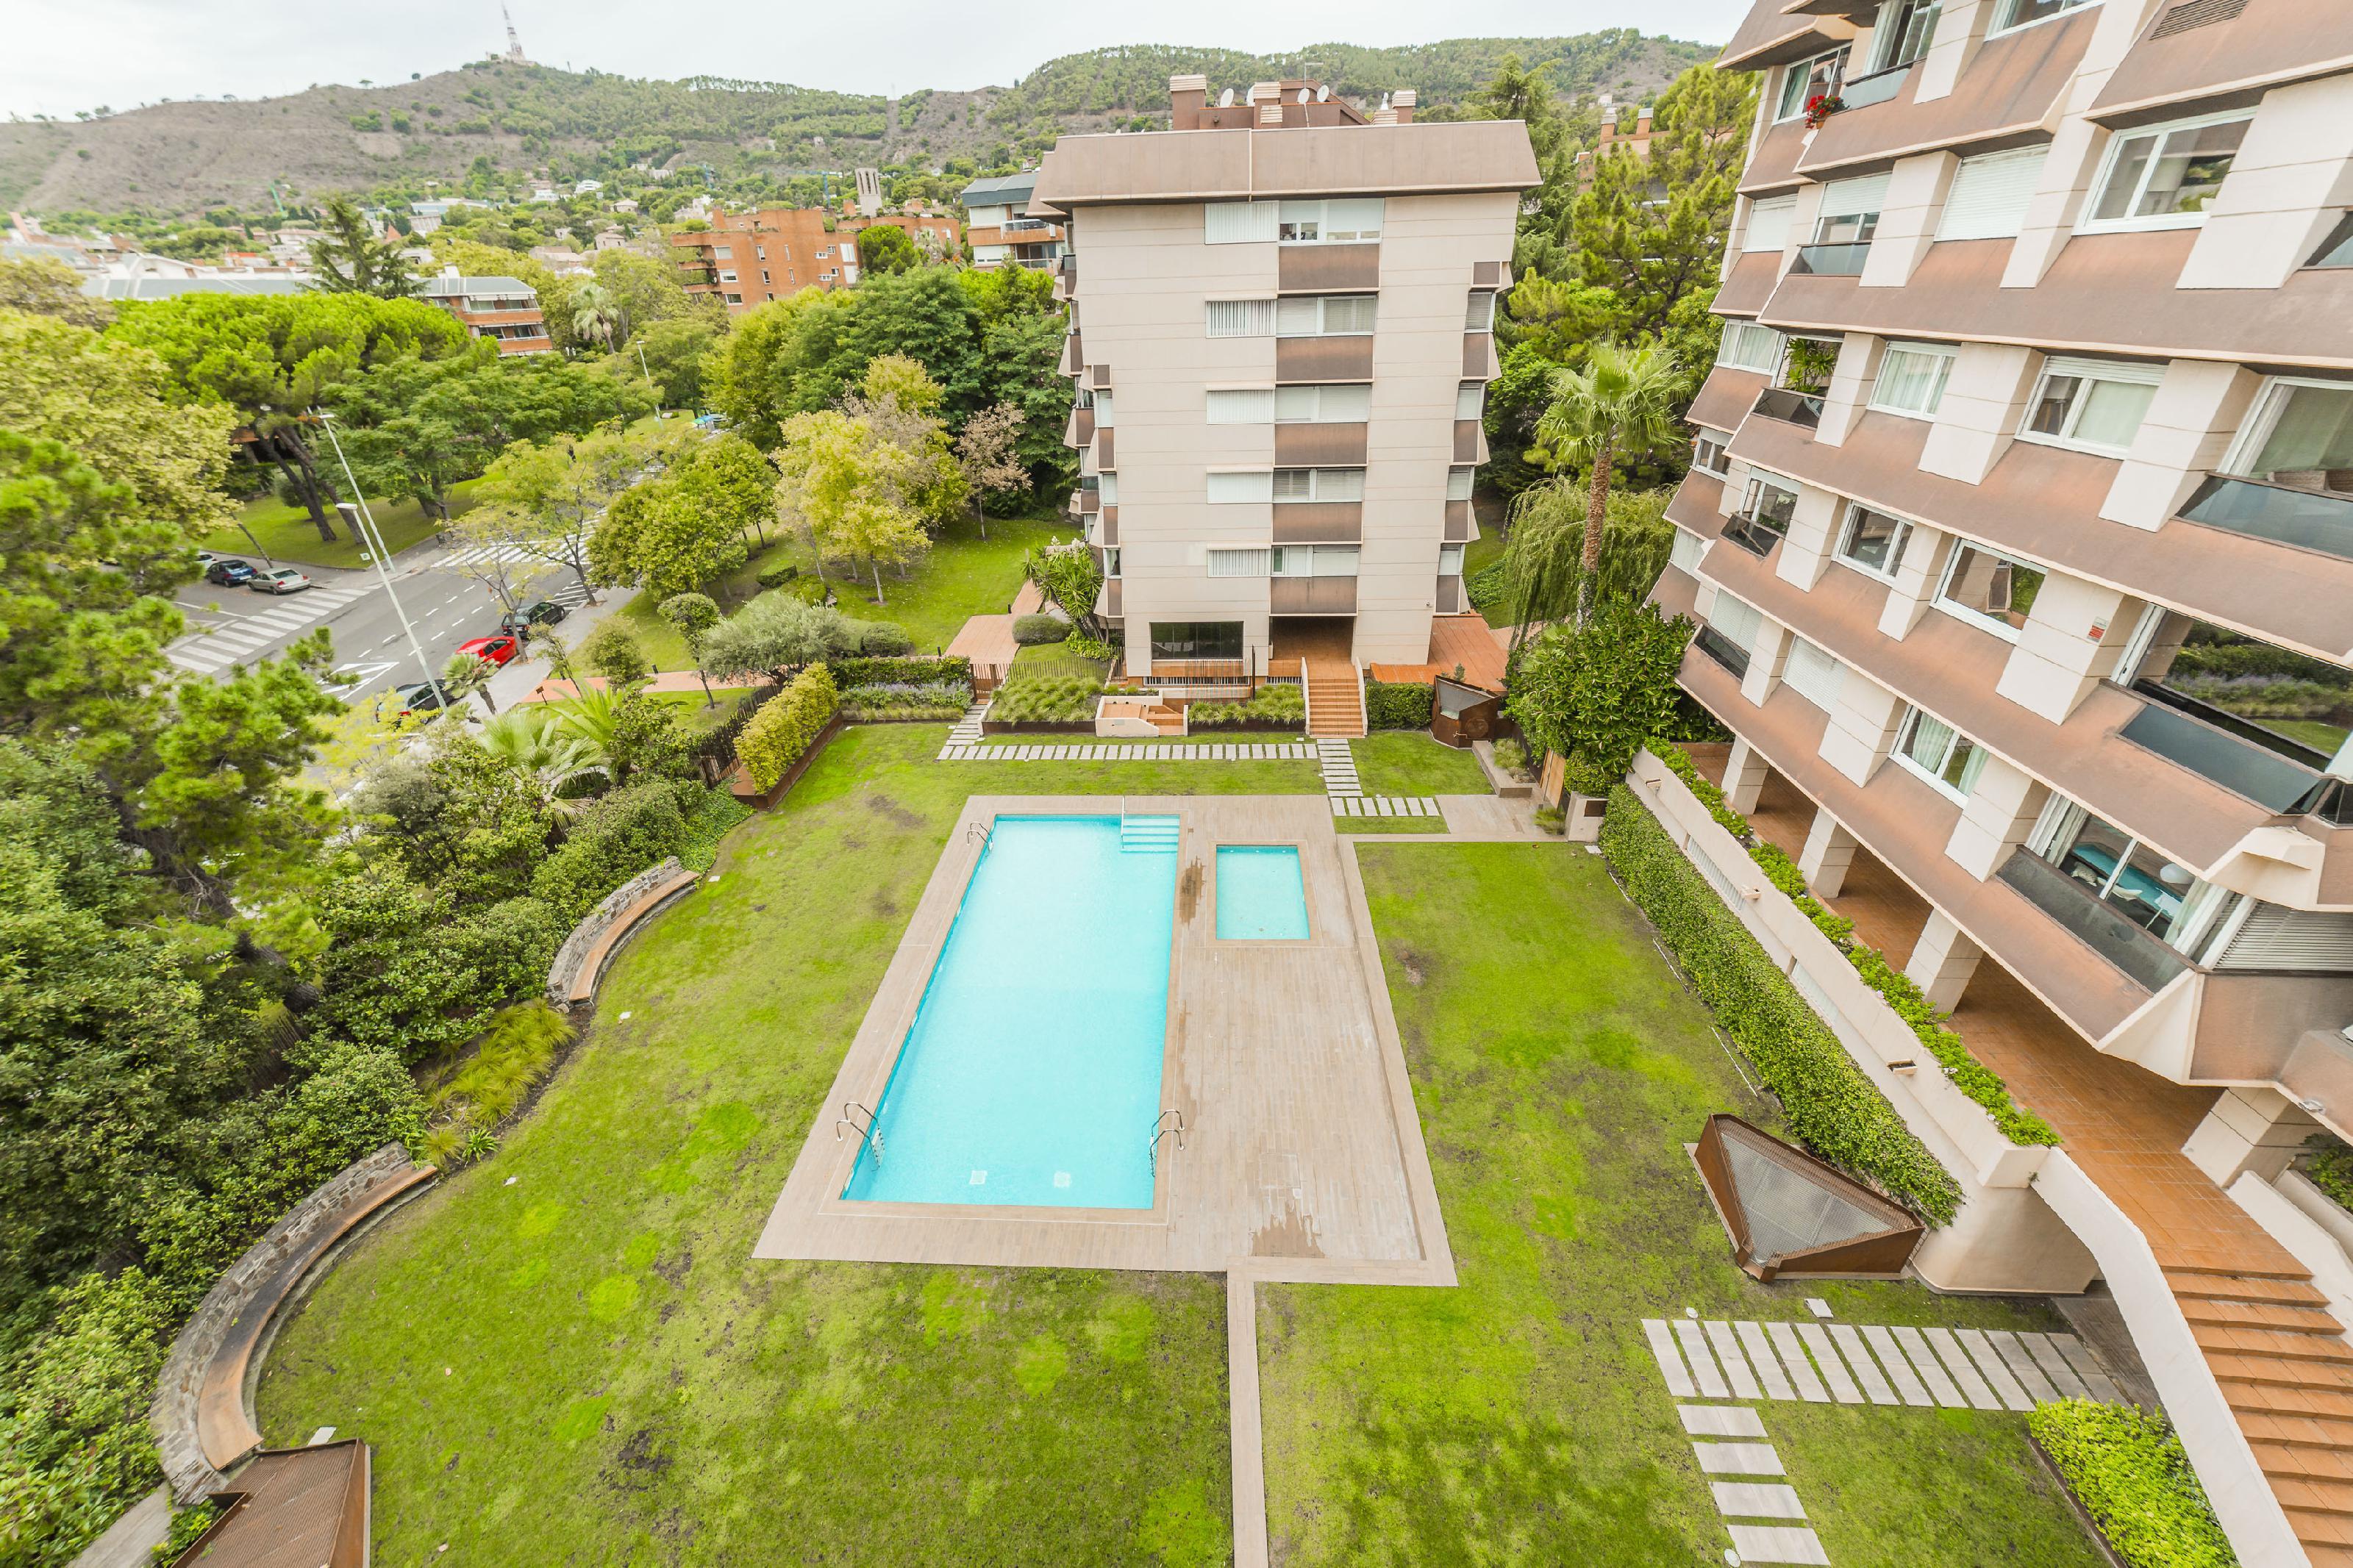 253684 Penthouse for sale in Sarrià-Sant Gervasi, Sarrià 33